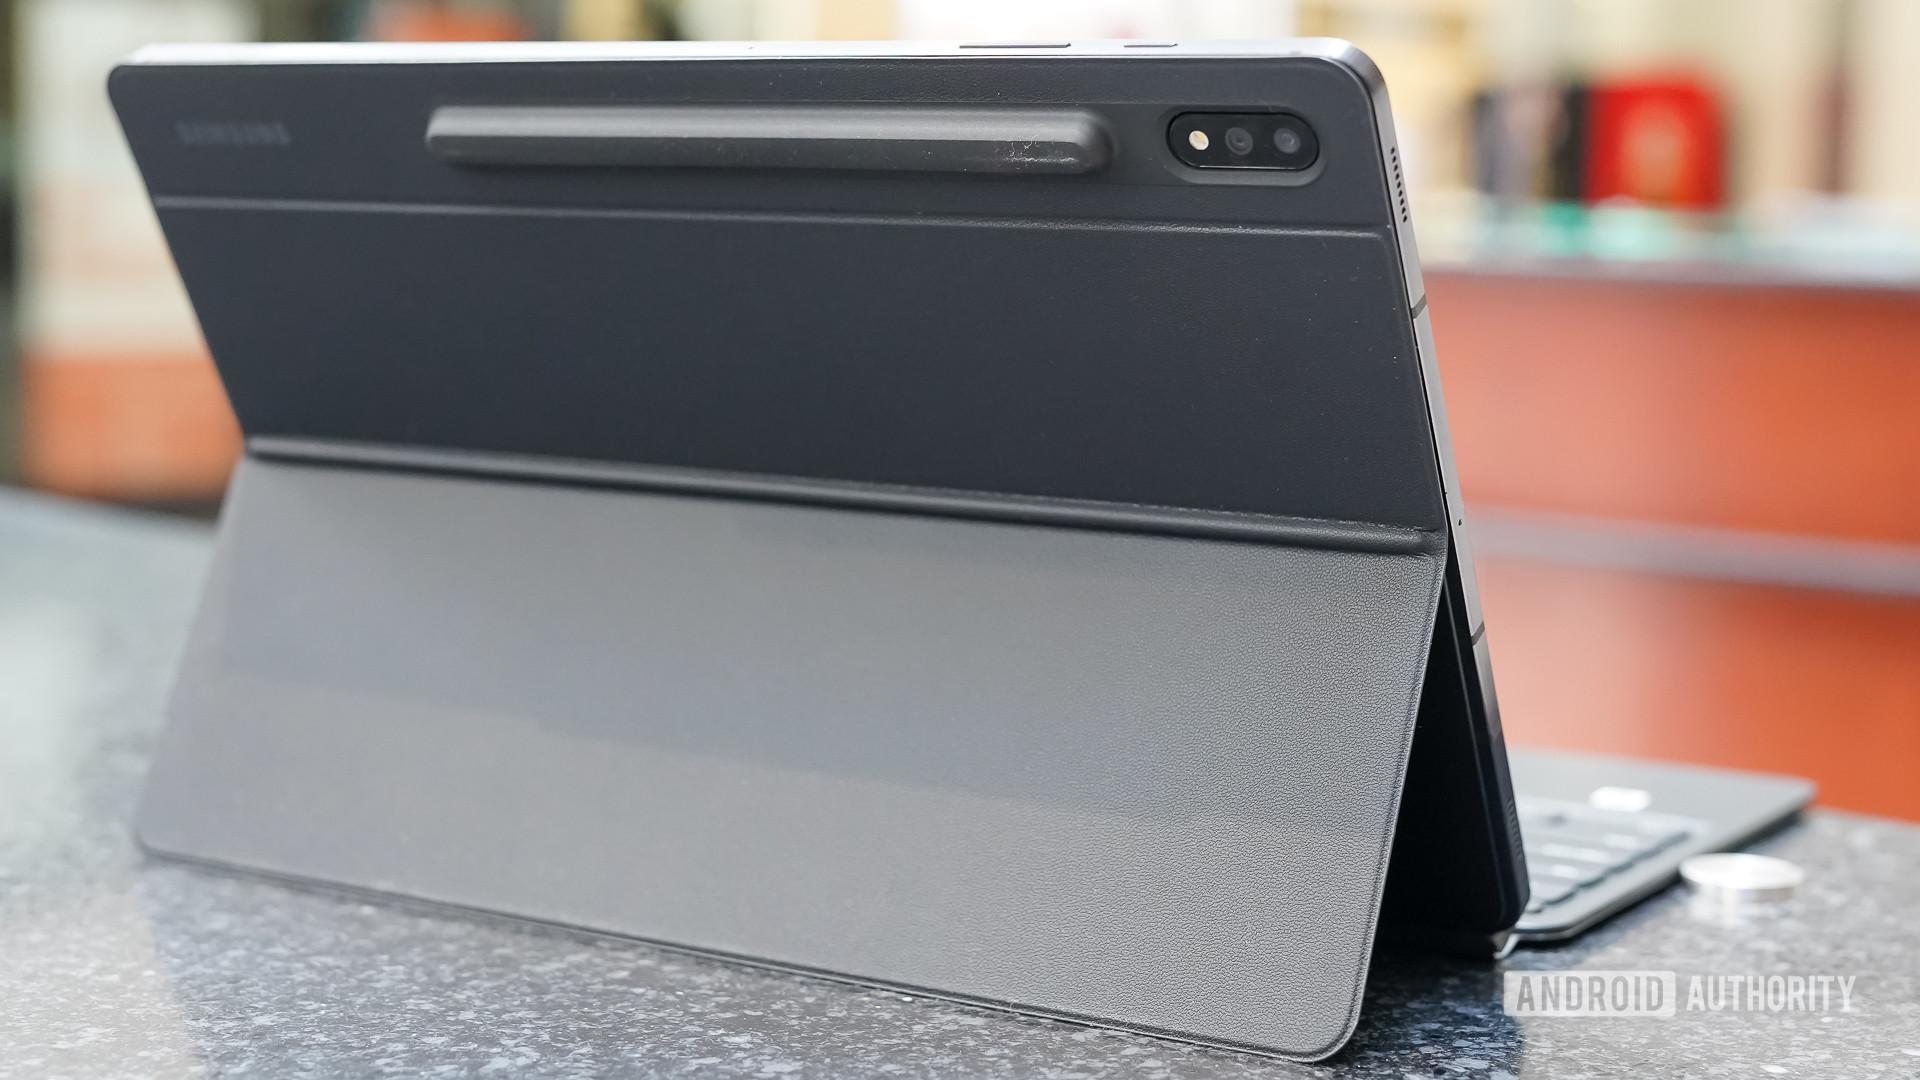 Samsung Galaxy Tab S7 Plus rear profile